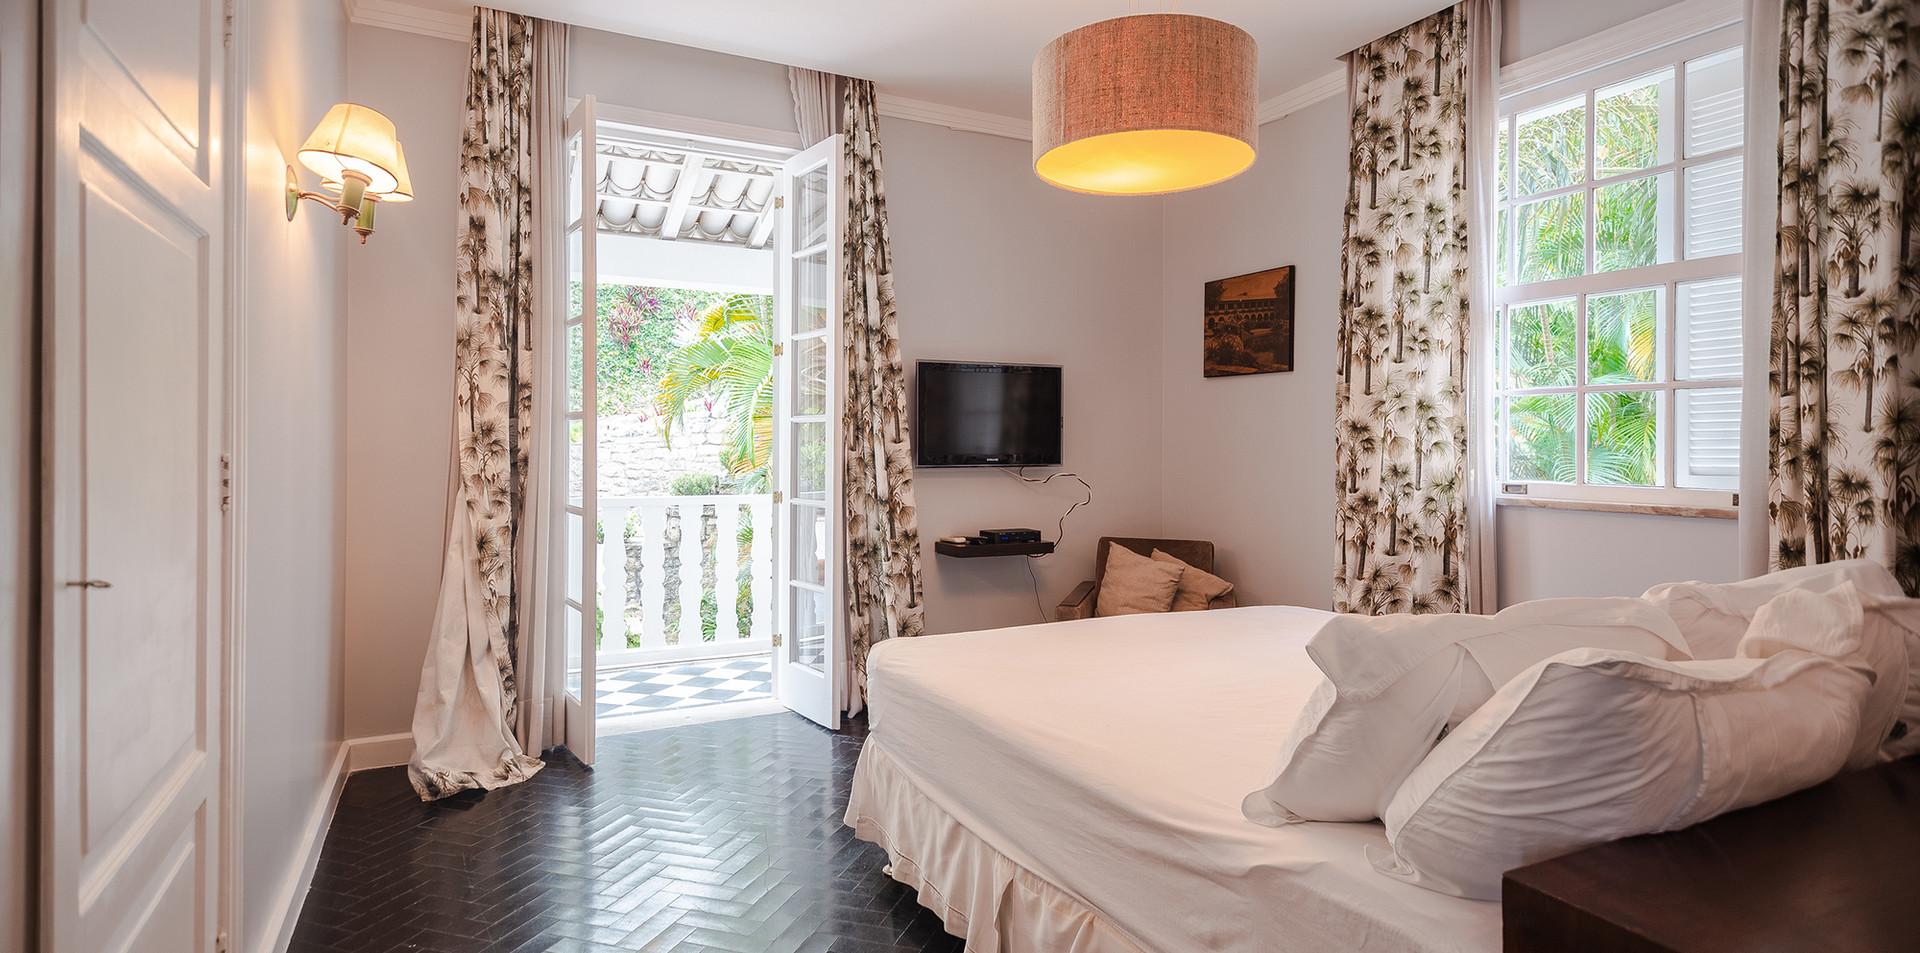 L'Homme de Rio Hotel - Suíte 3 Botafogo